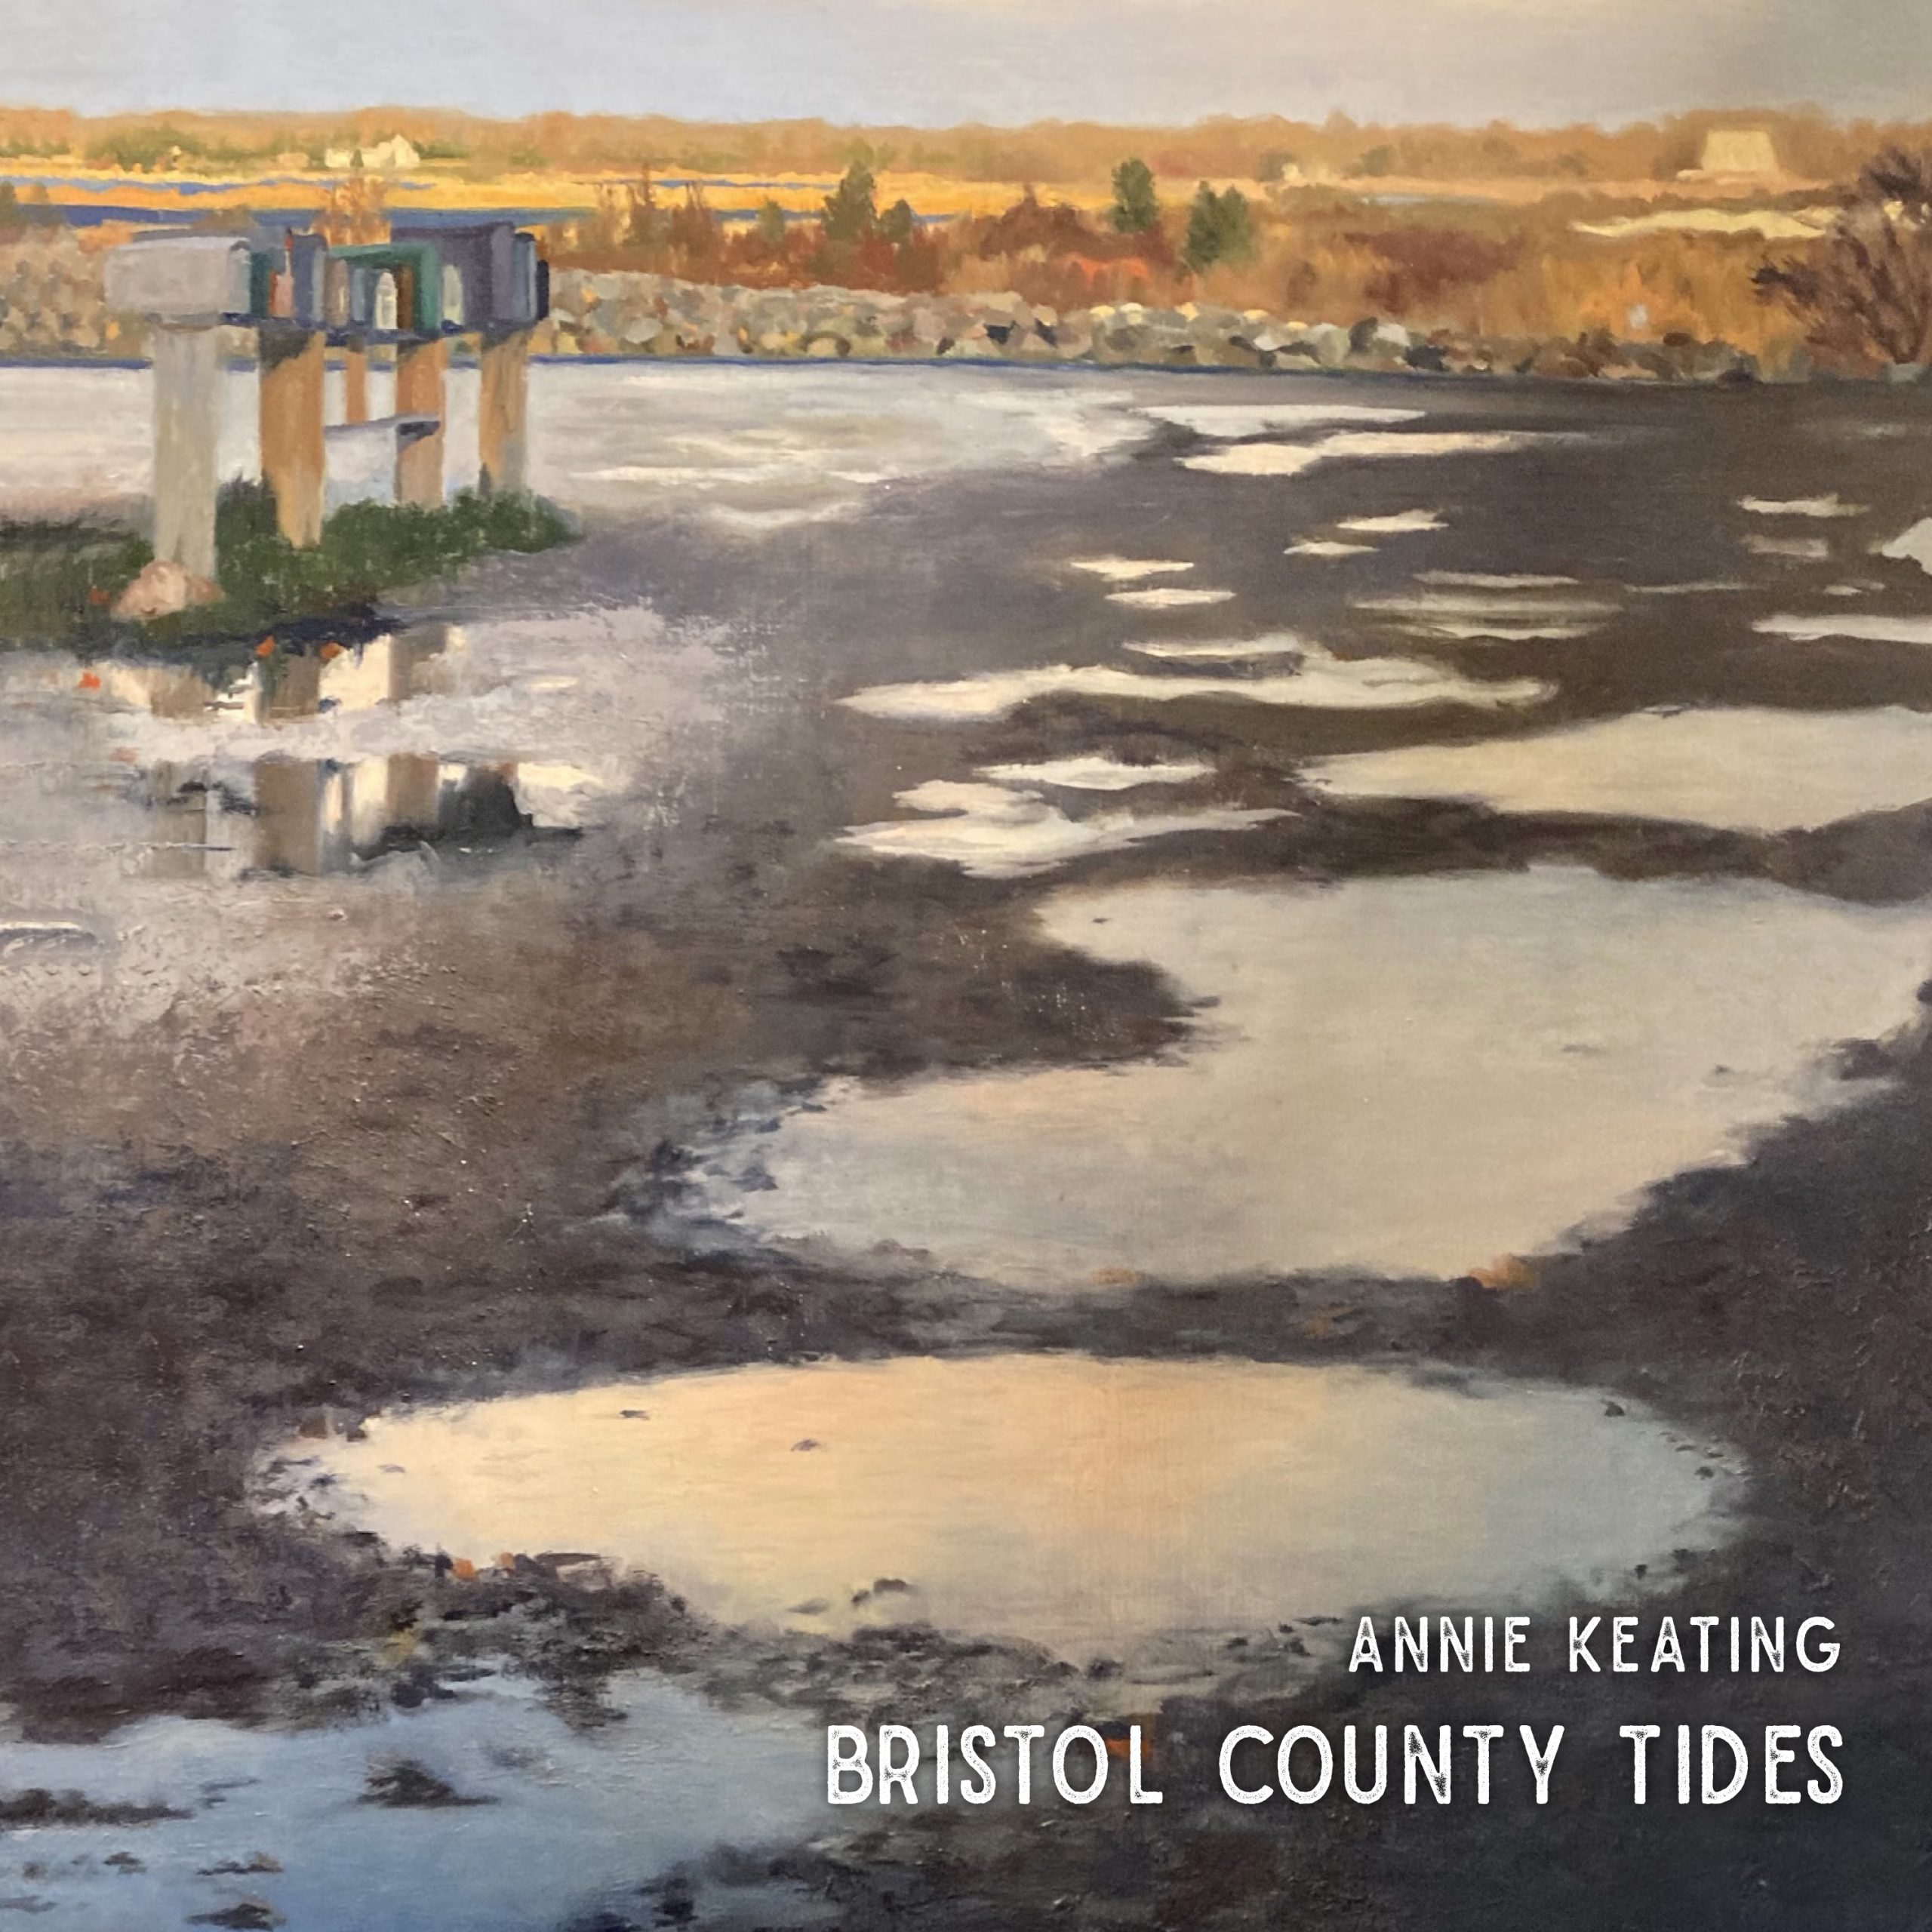 ANNIE KEATING - Bristol County Tides